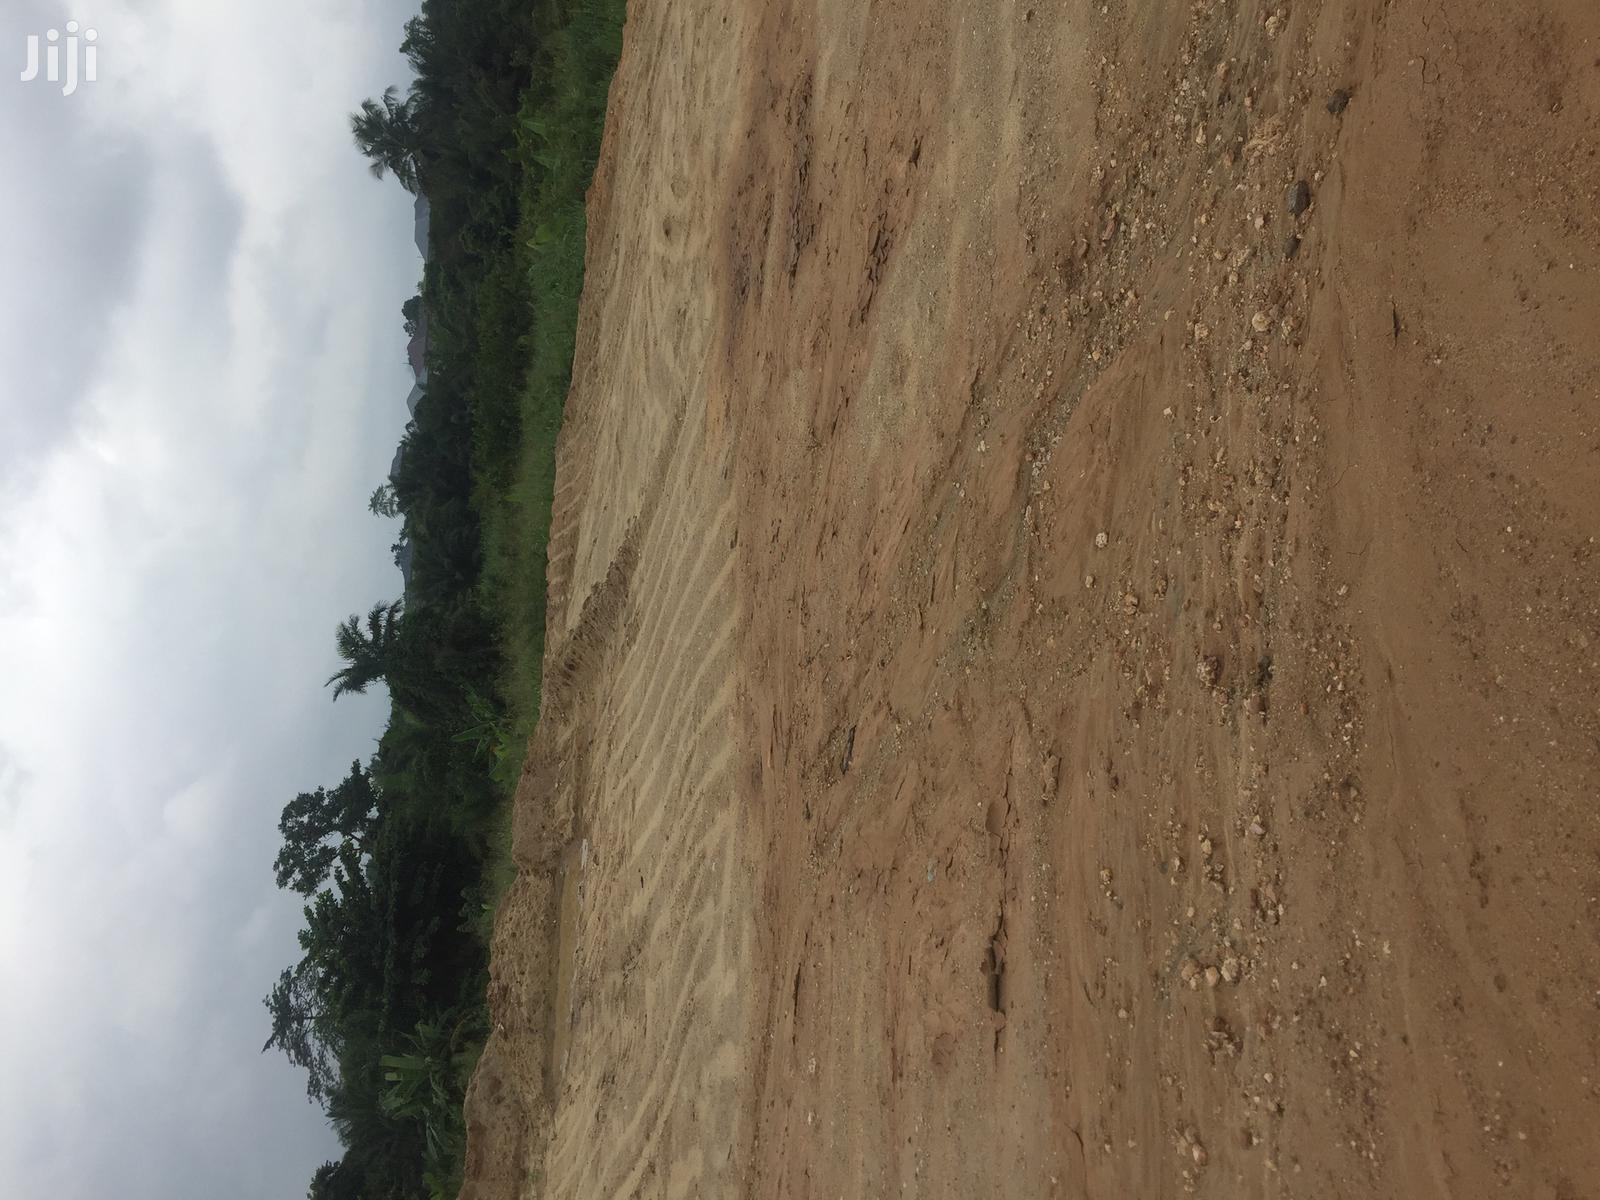 2 Plots of Land for Sale at Nsawam Kumasi Main Road   Land & Plots For Sale for sale in Akuapim South, Eastern Region, Ghana